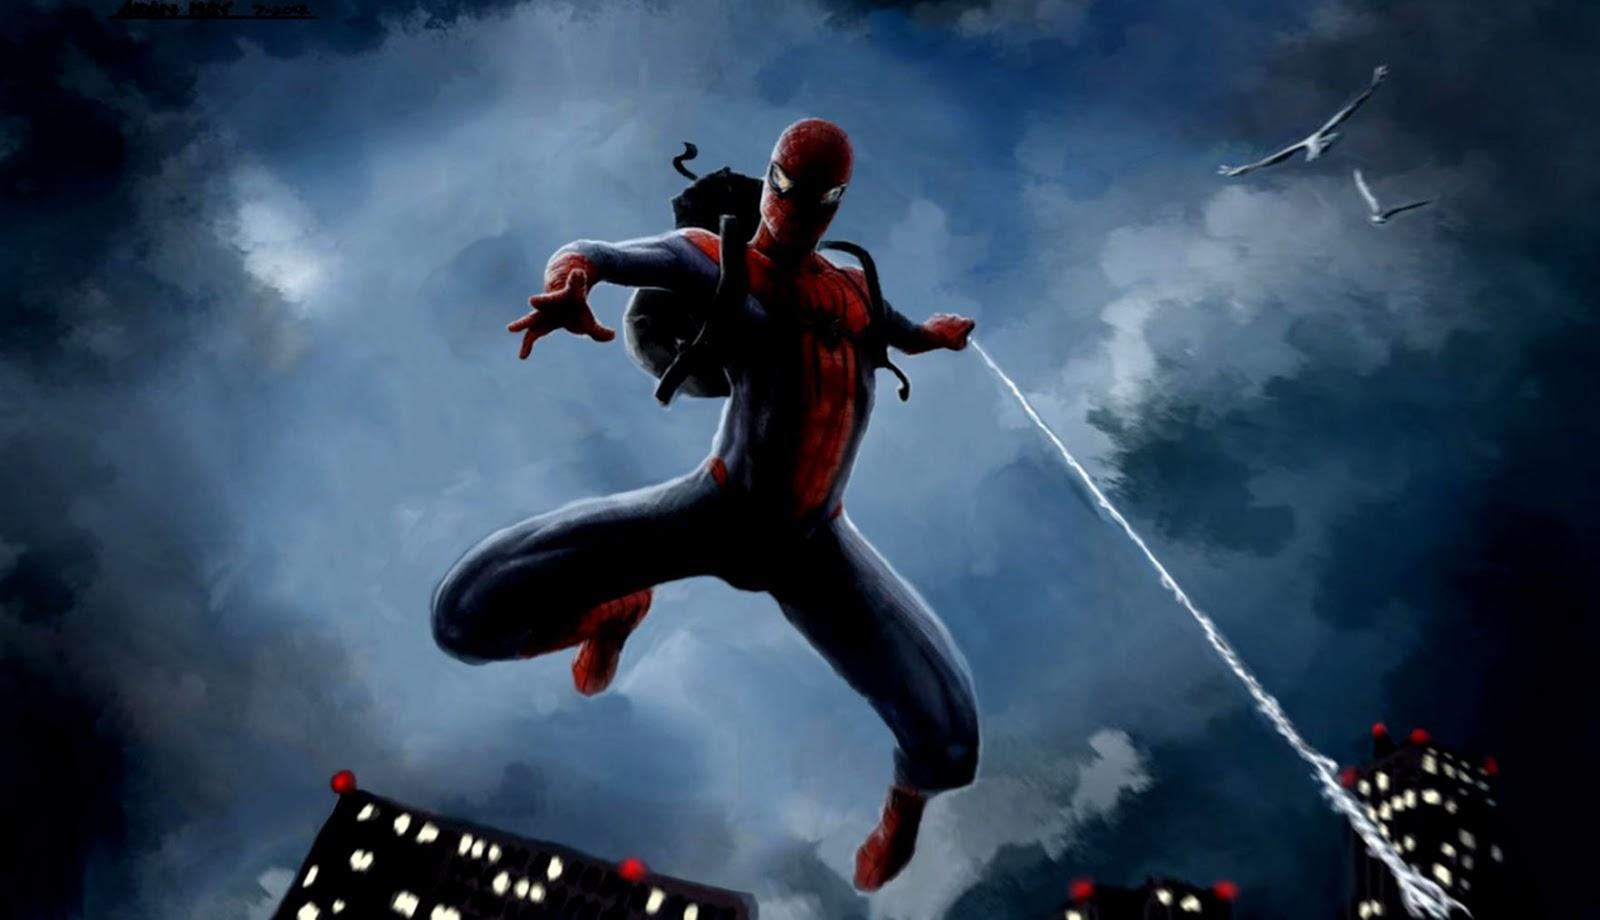 Game Spider Man Hd Wallpaper Wallpapers Snipe